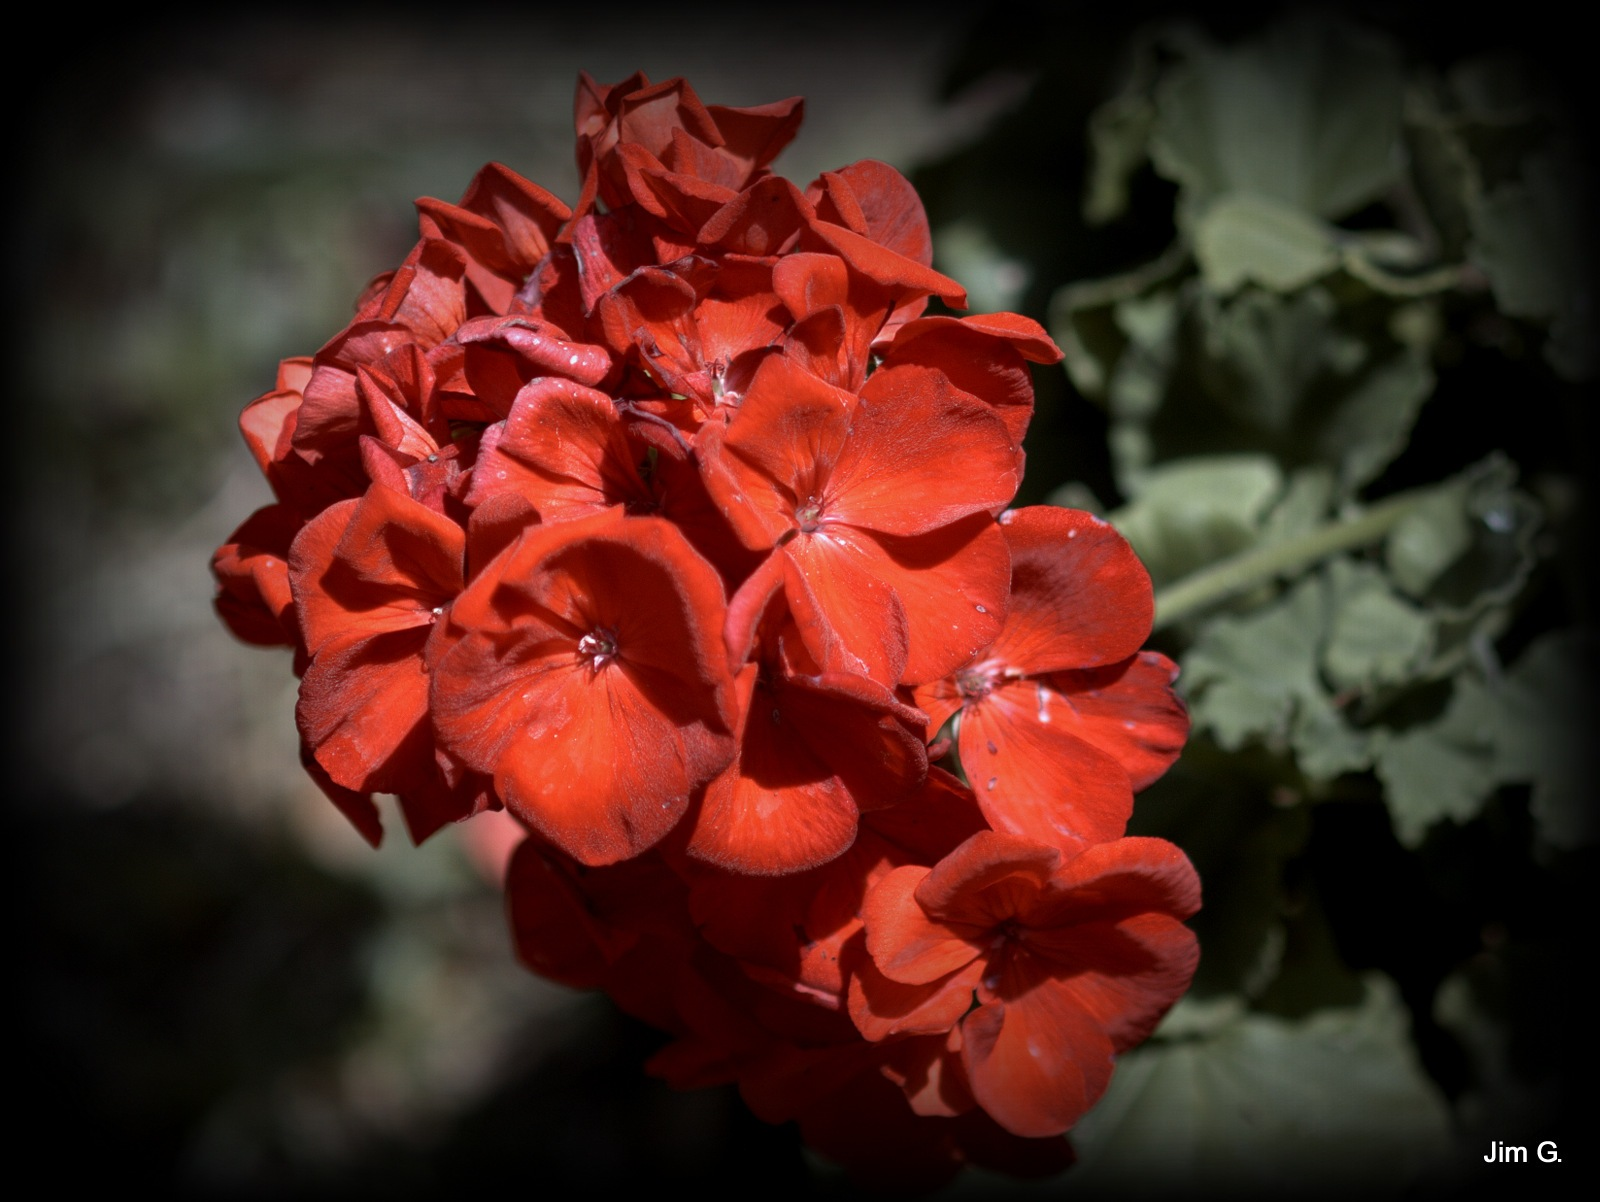 Geranium Bloom Cluster by Jim Graham